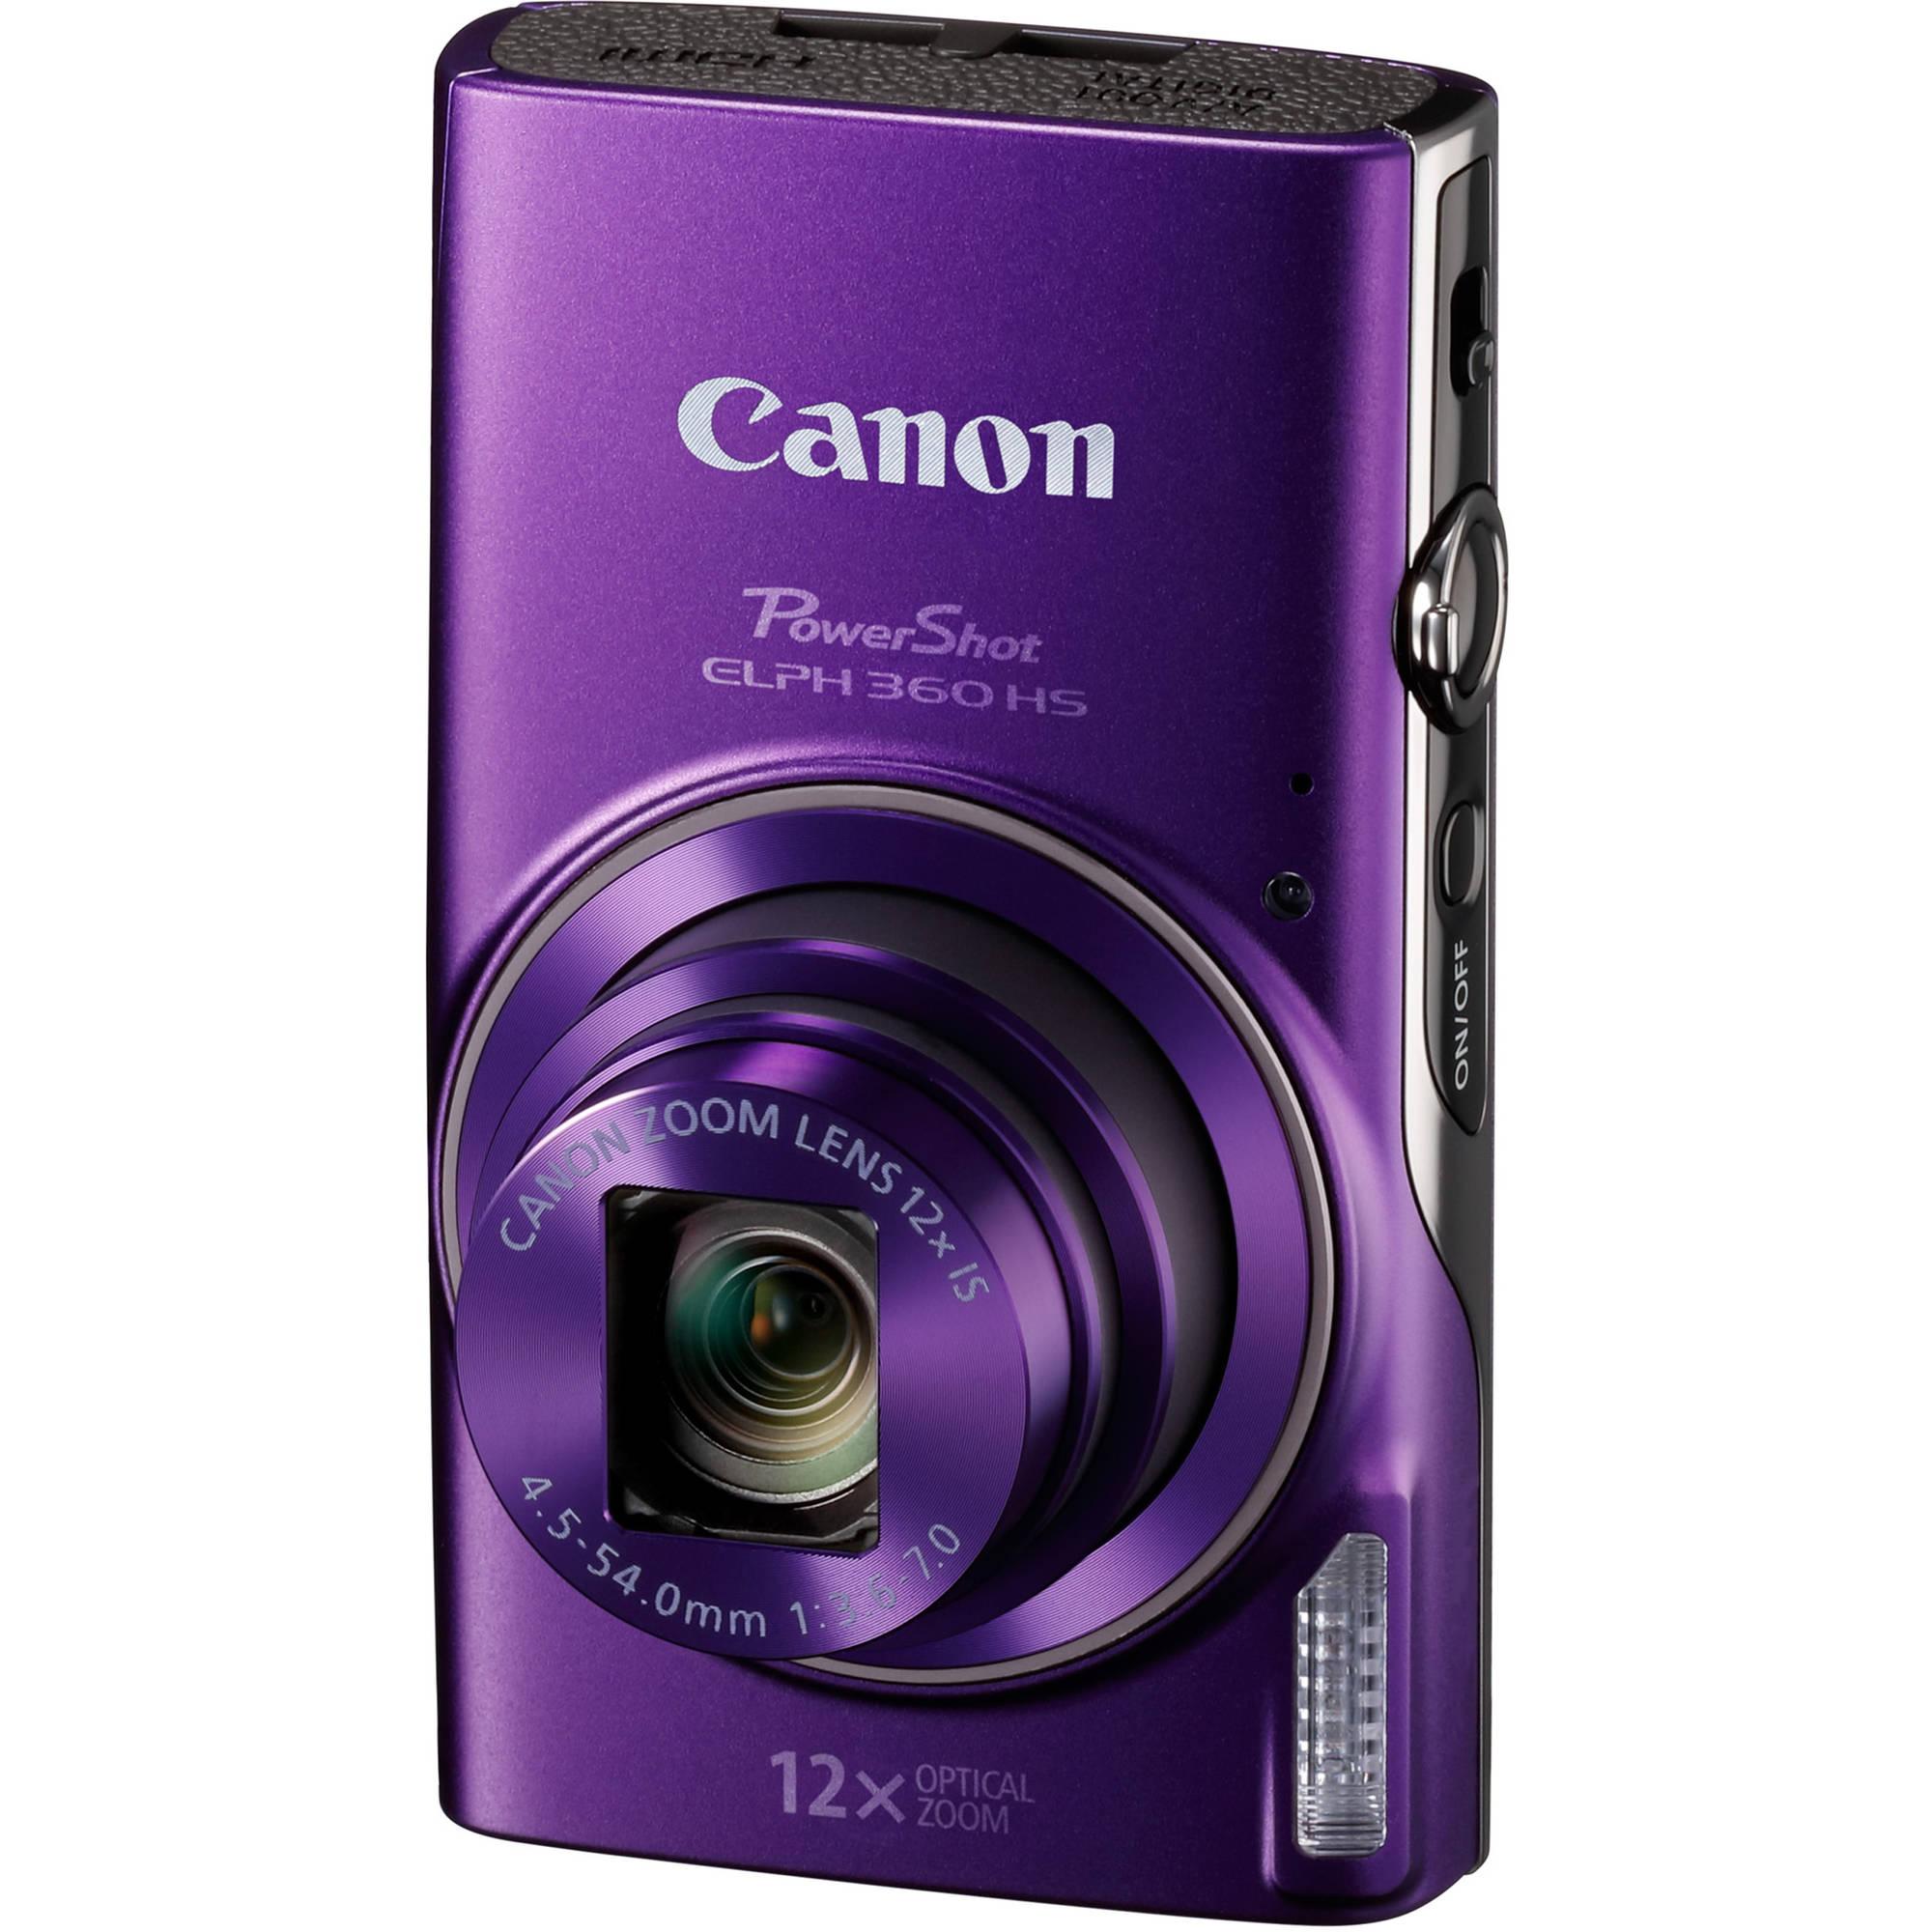 32GB Memory Card for Canon PowerShot ELPH 340 HS//IXUS 265 HS